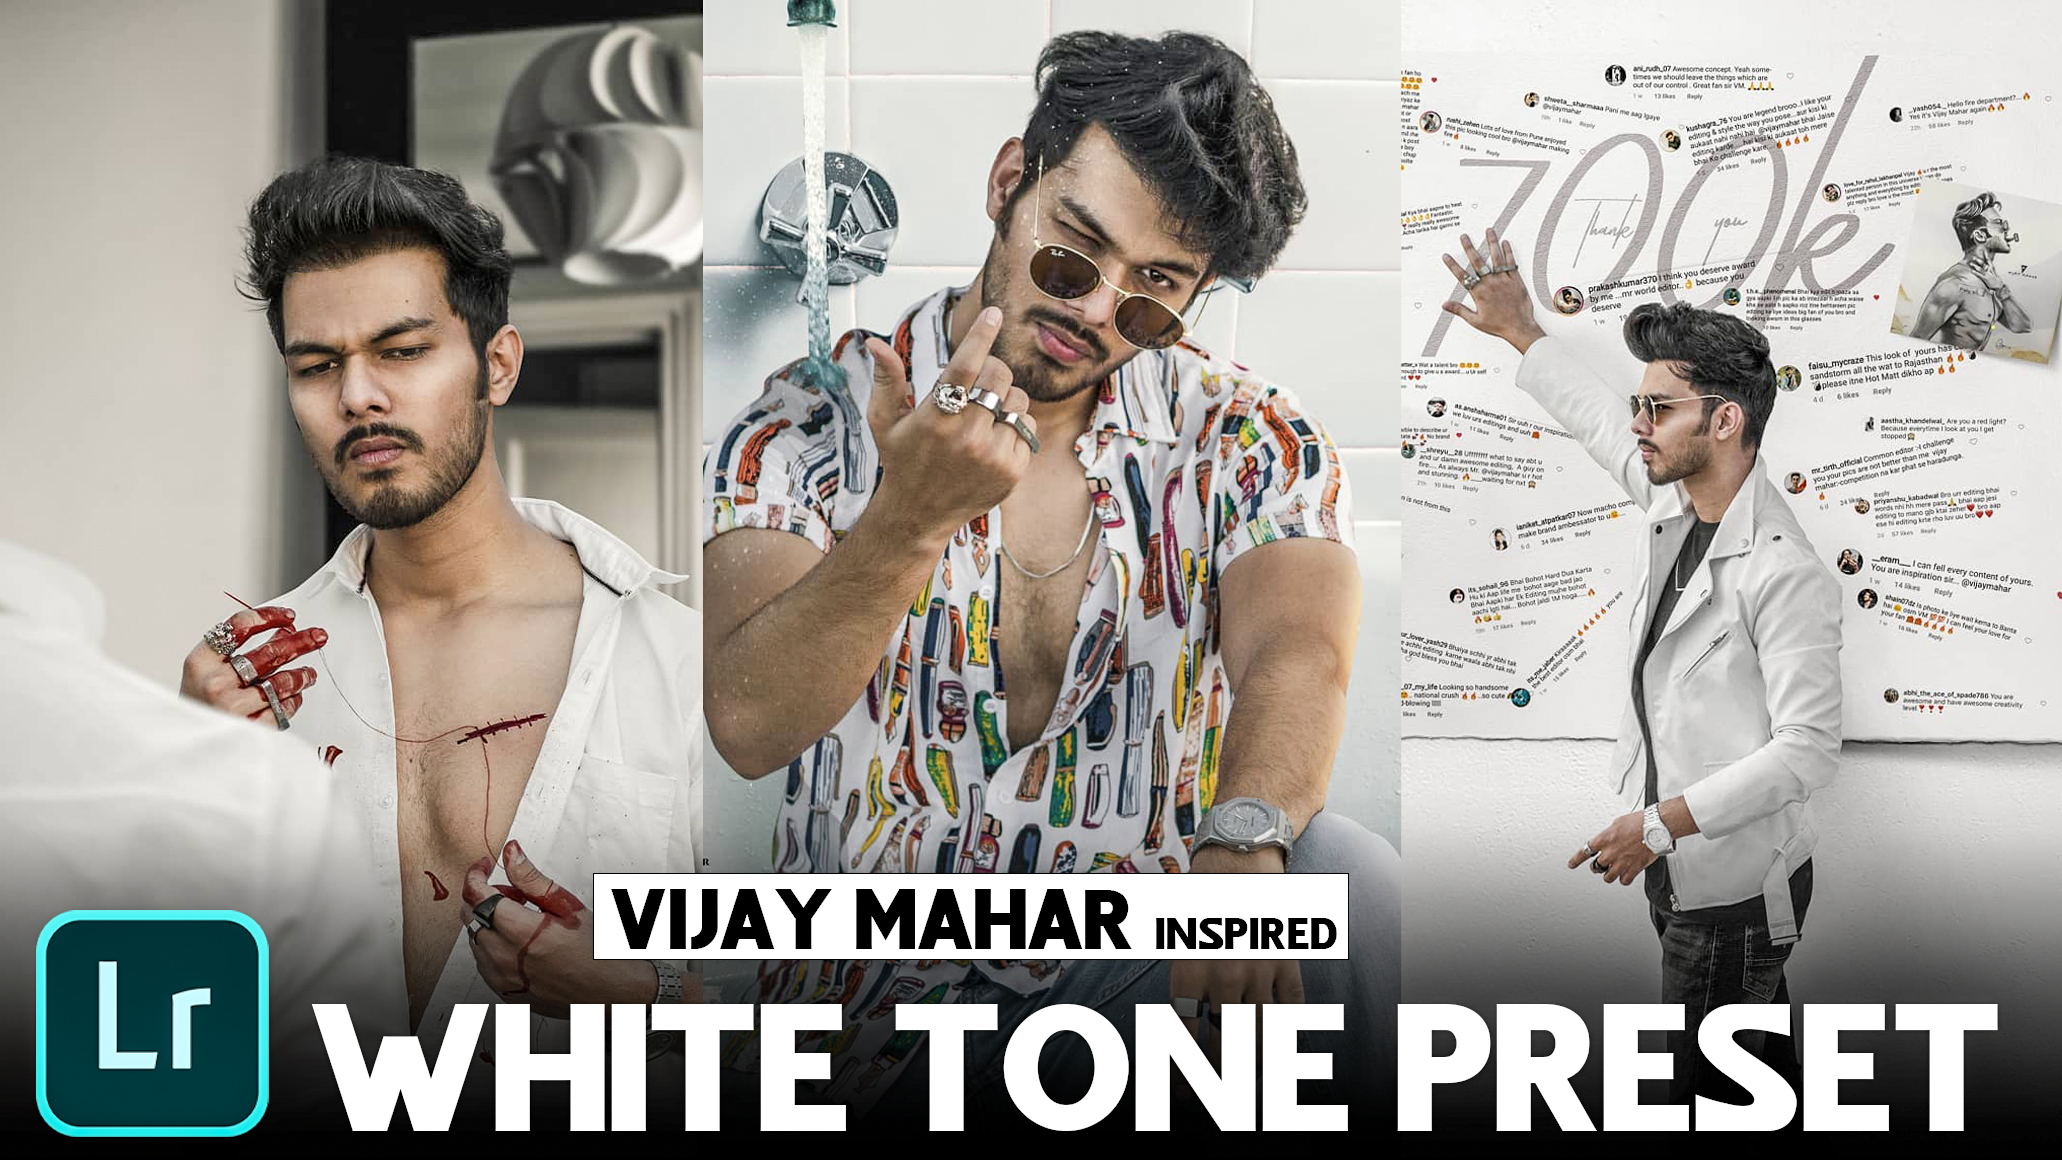 vijay mahar white tone Lightroom presets download FREE